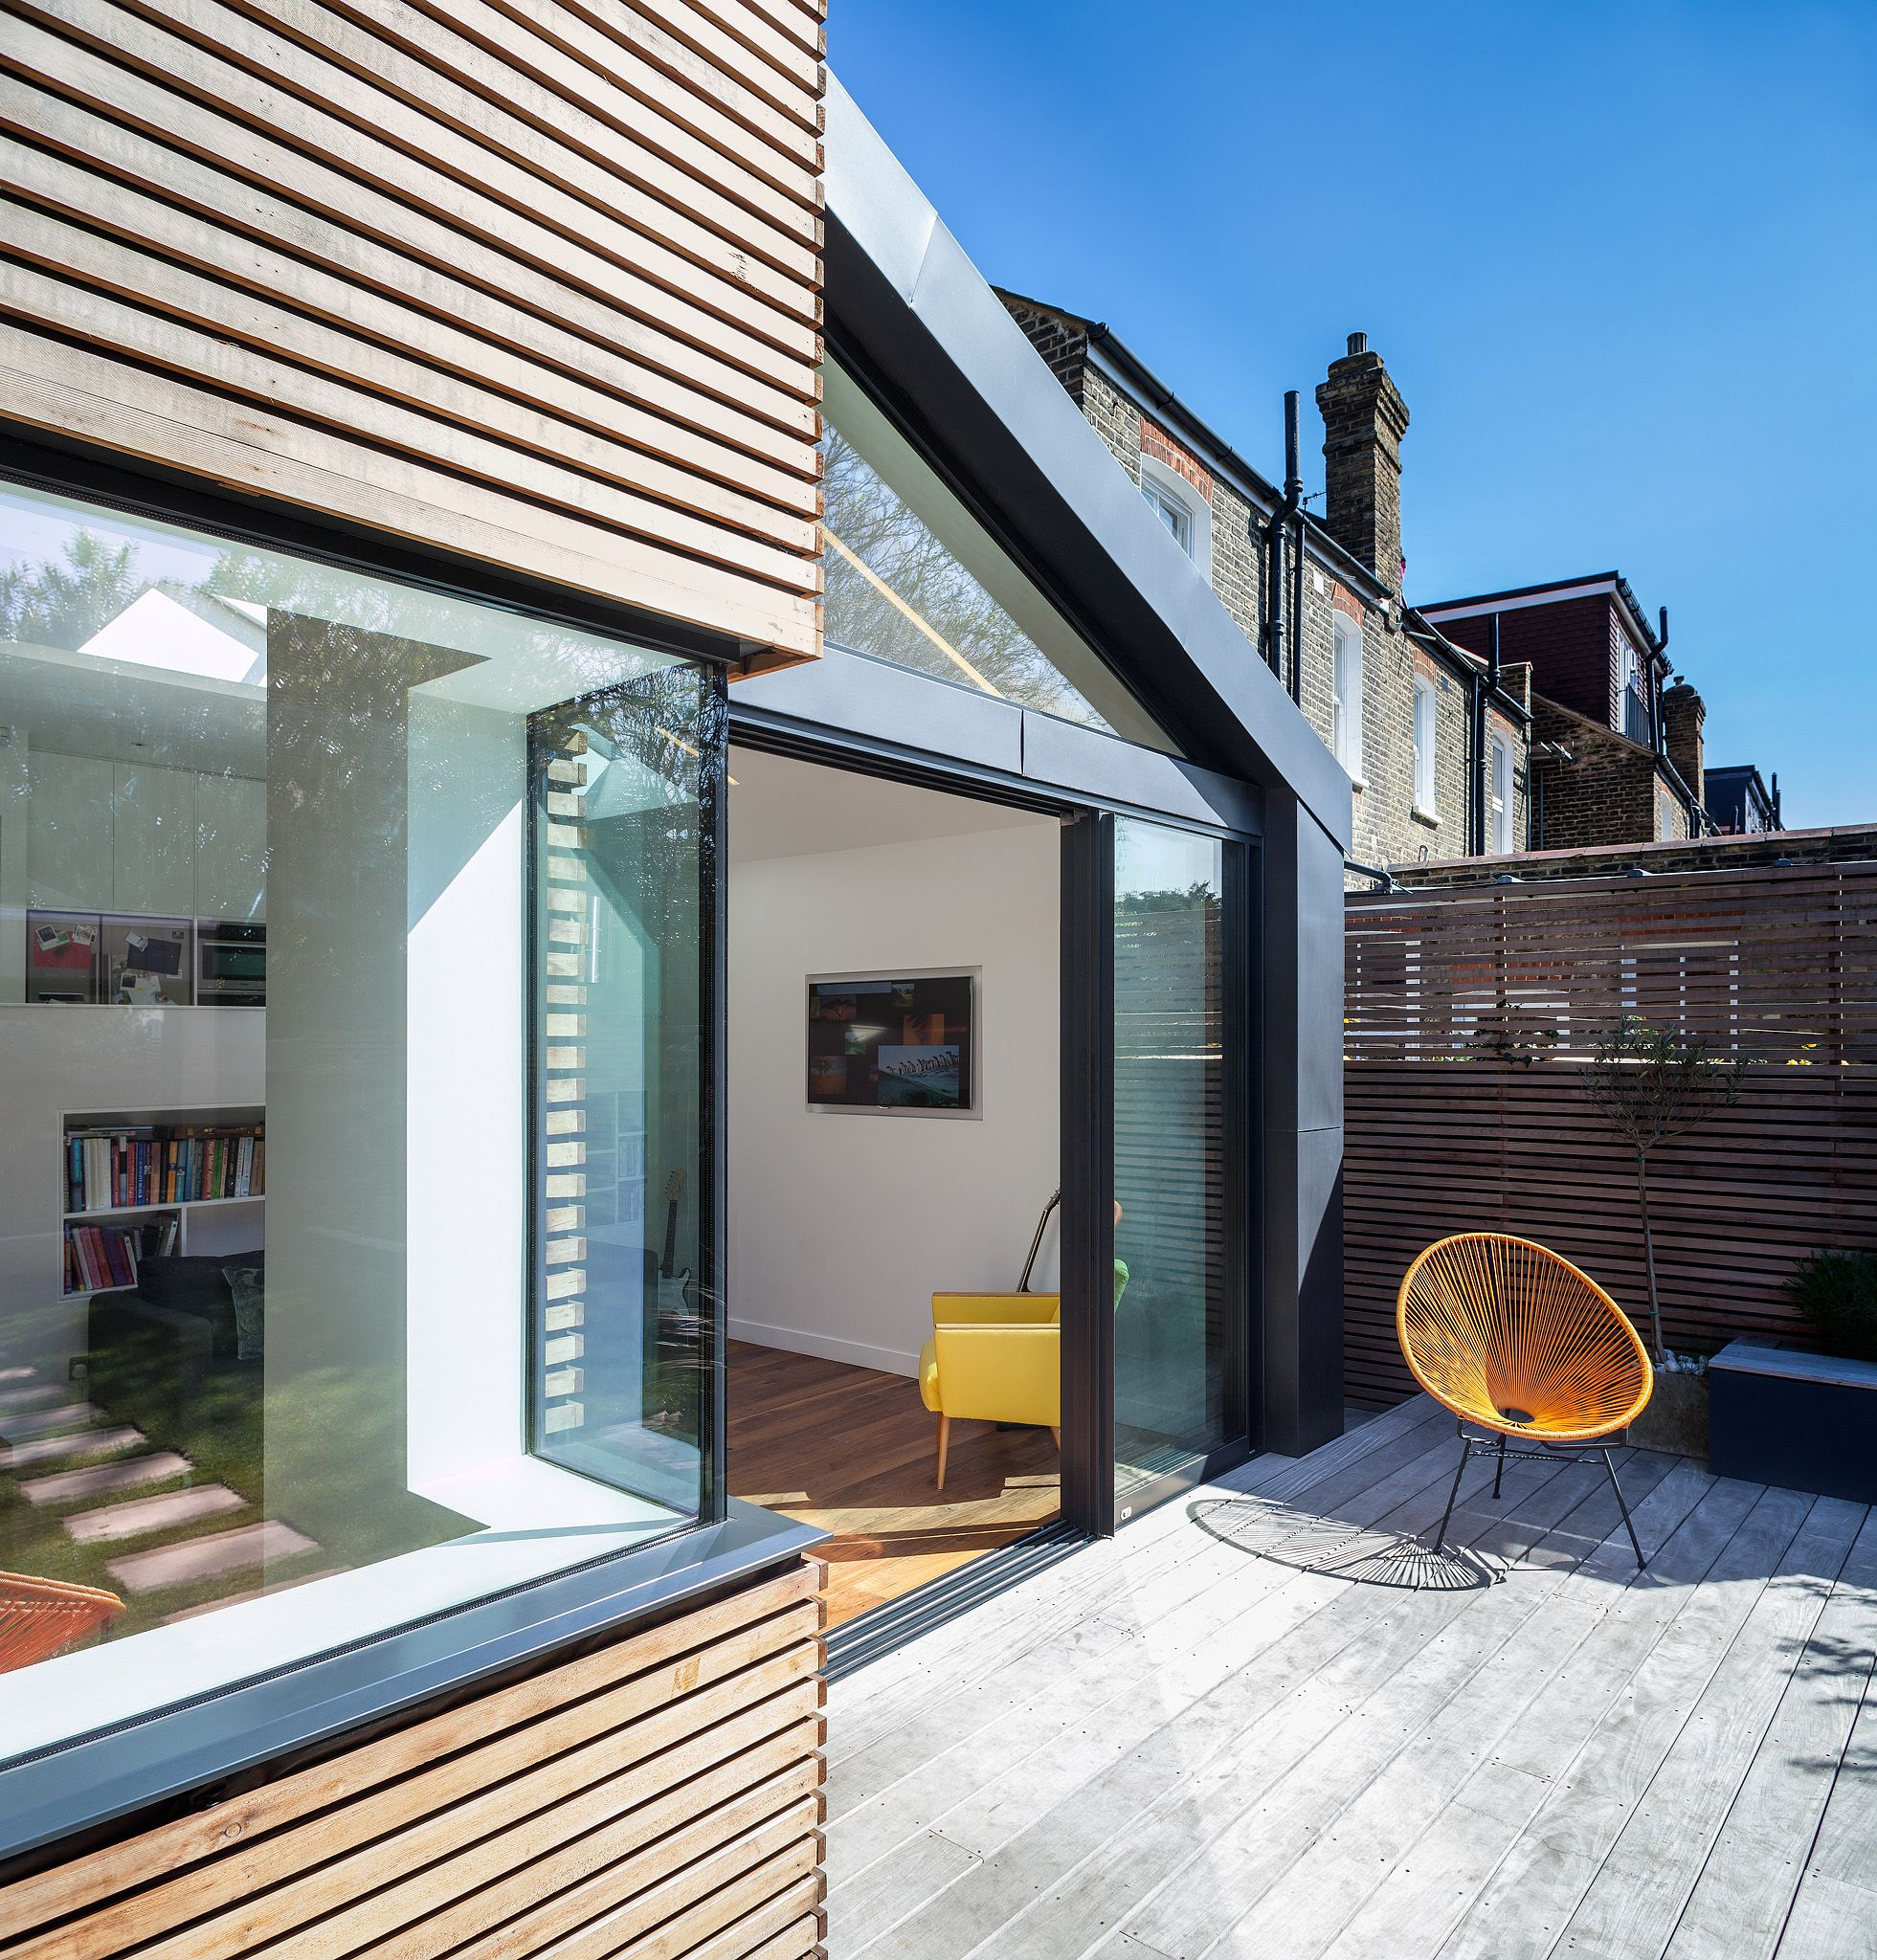 Lights The Garage London: Maxlight Sliding Doors, Corner Bay Window And Rooflight